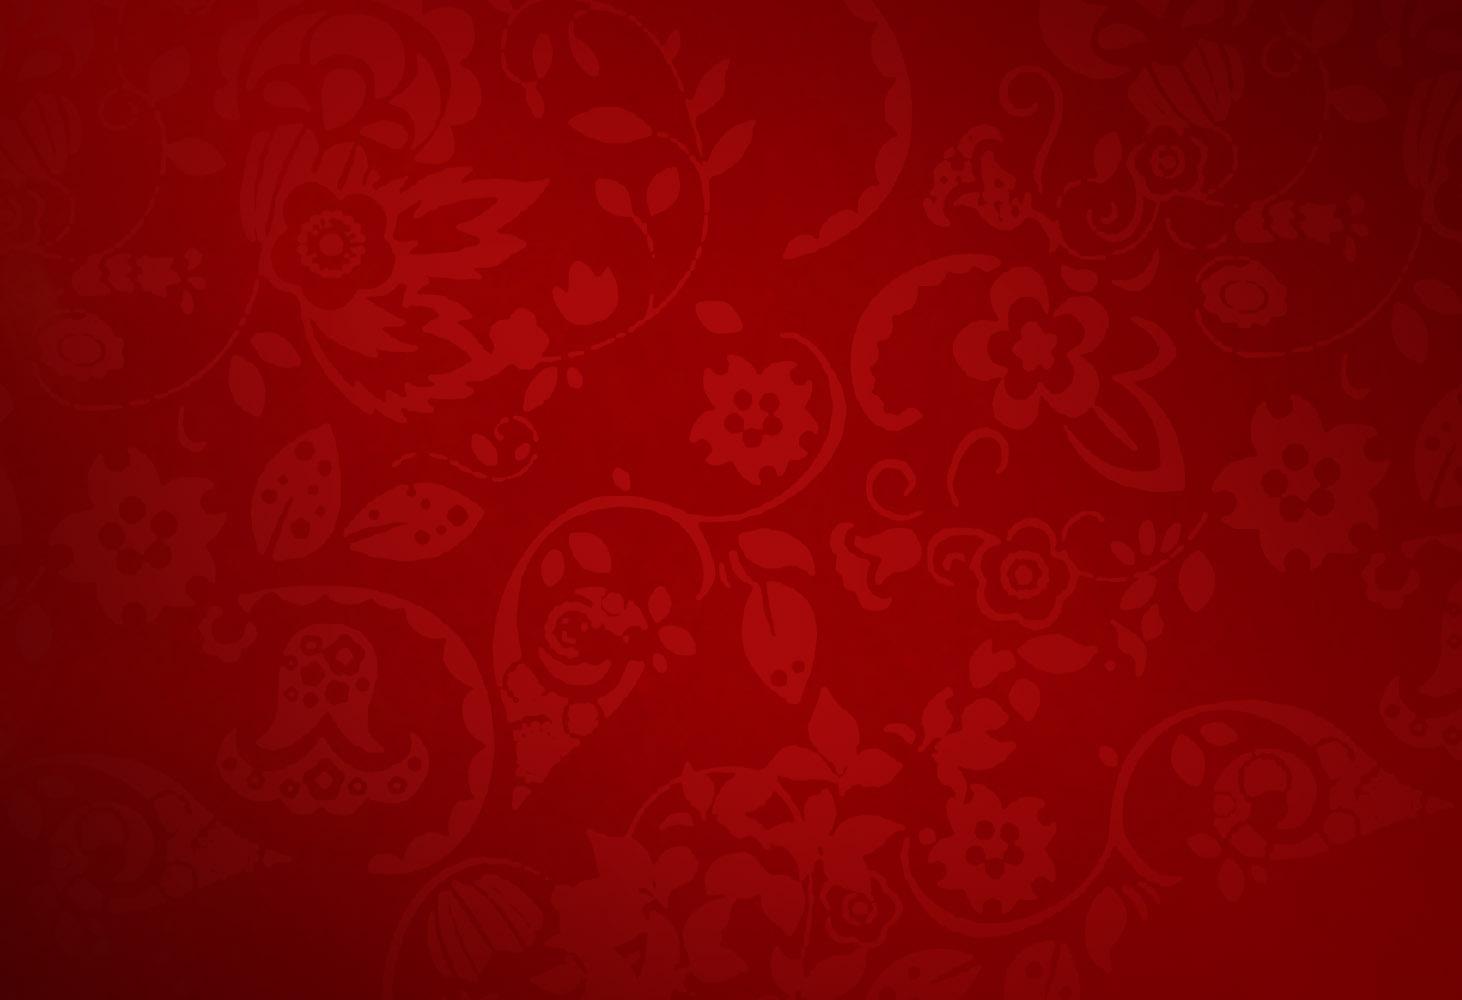 https://cdn.wallpapersafari.com/87/70/KwyAJF.jpg